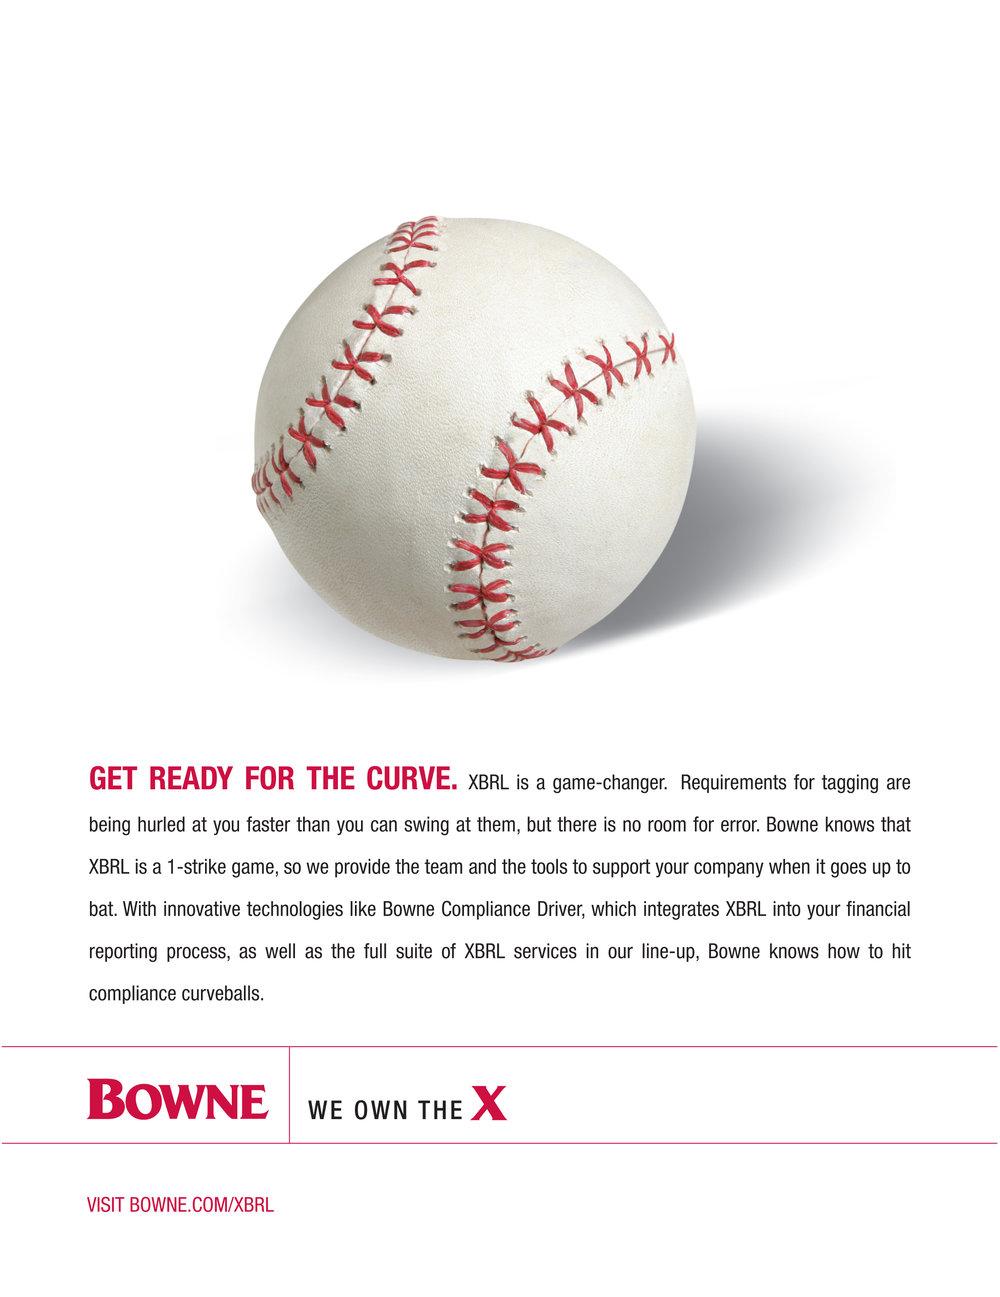 Bowne BBL Ad.jpg